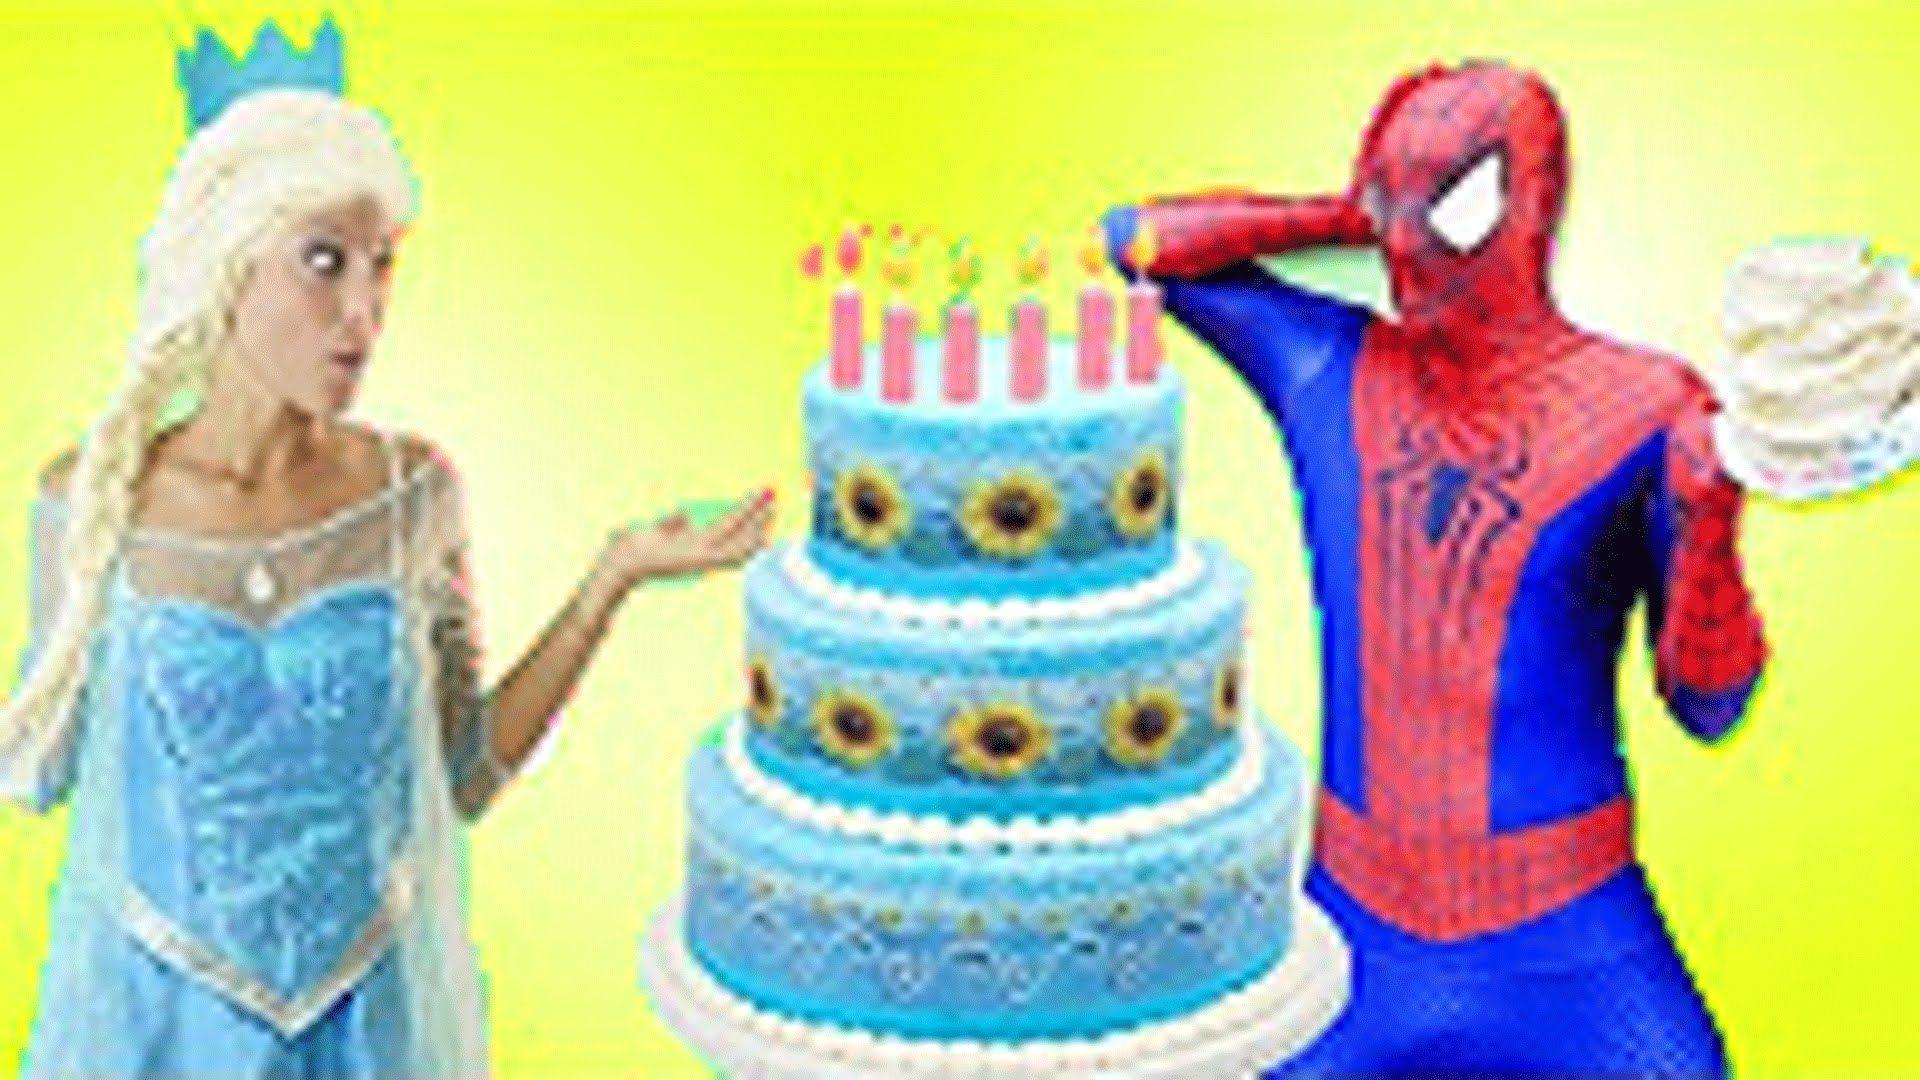 Spiderman Anna Elsa Frozen Birthday Maleficent vs Prank Baby